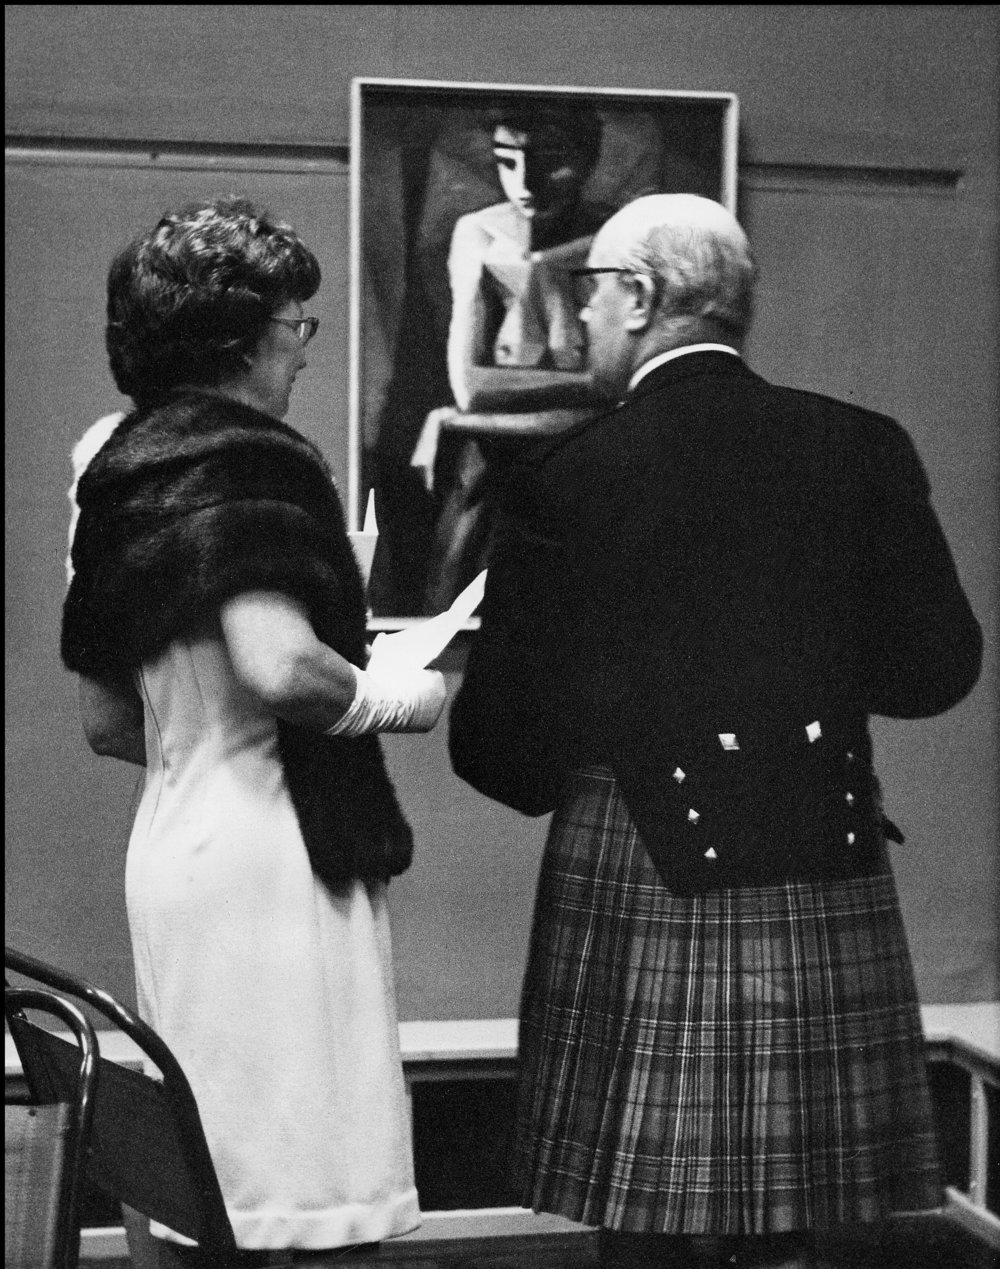 Mcr. Academy Fine Arts, 19-20-1  (1968).jpg